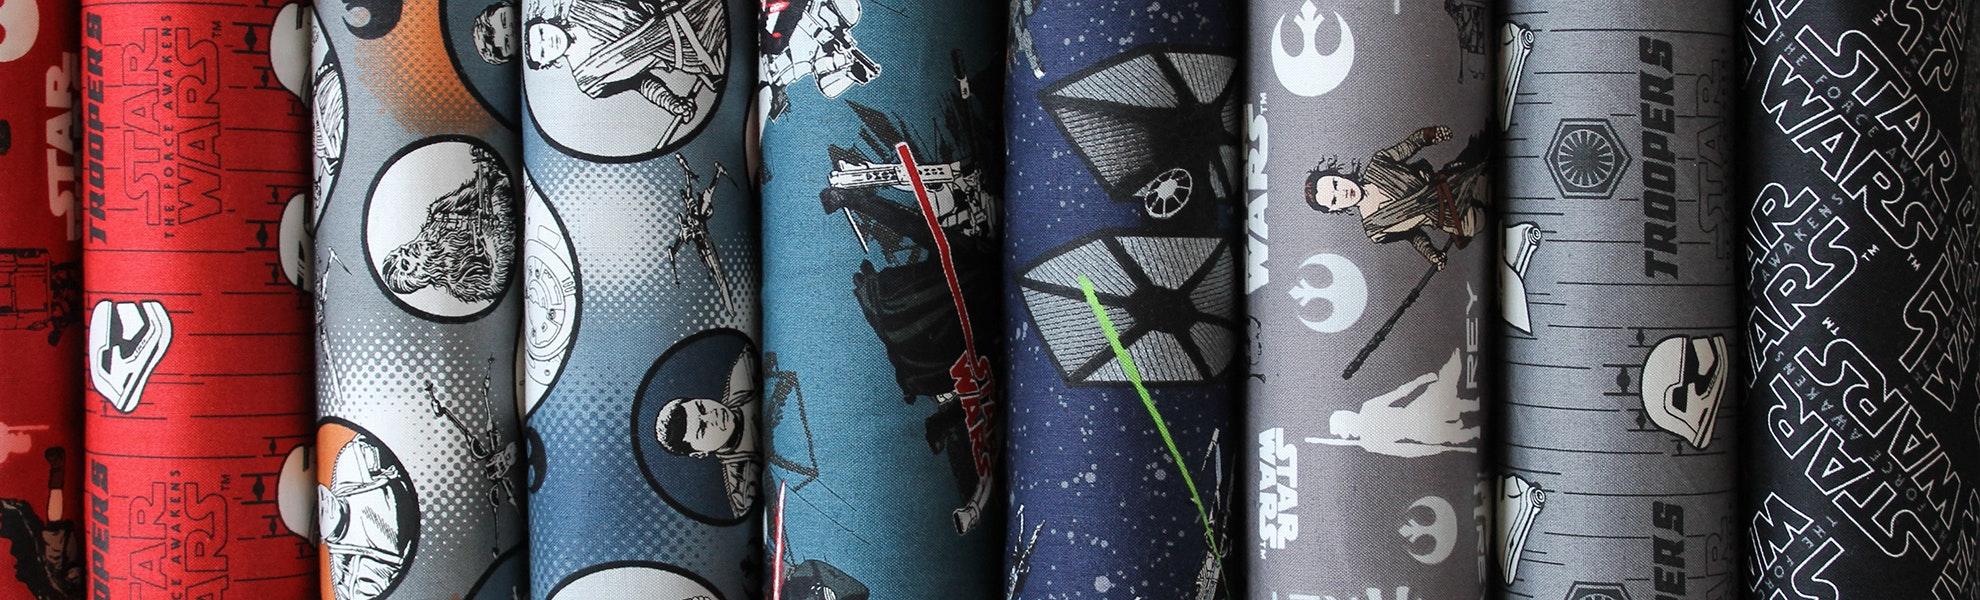 Star Wars: The Force Awakens Fat Quarter Bundle